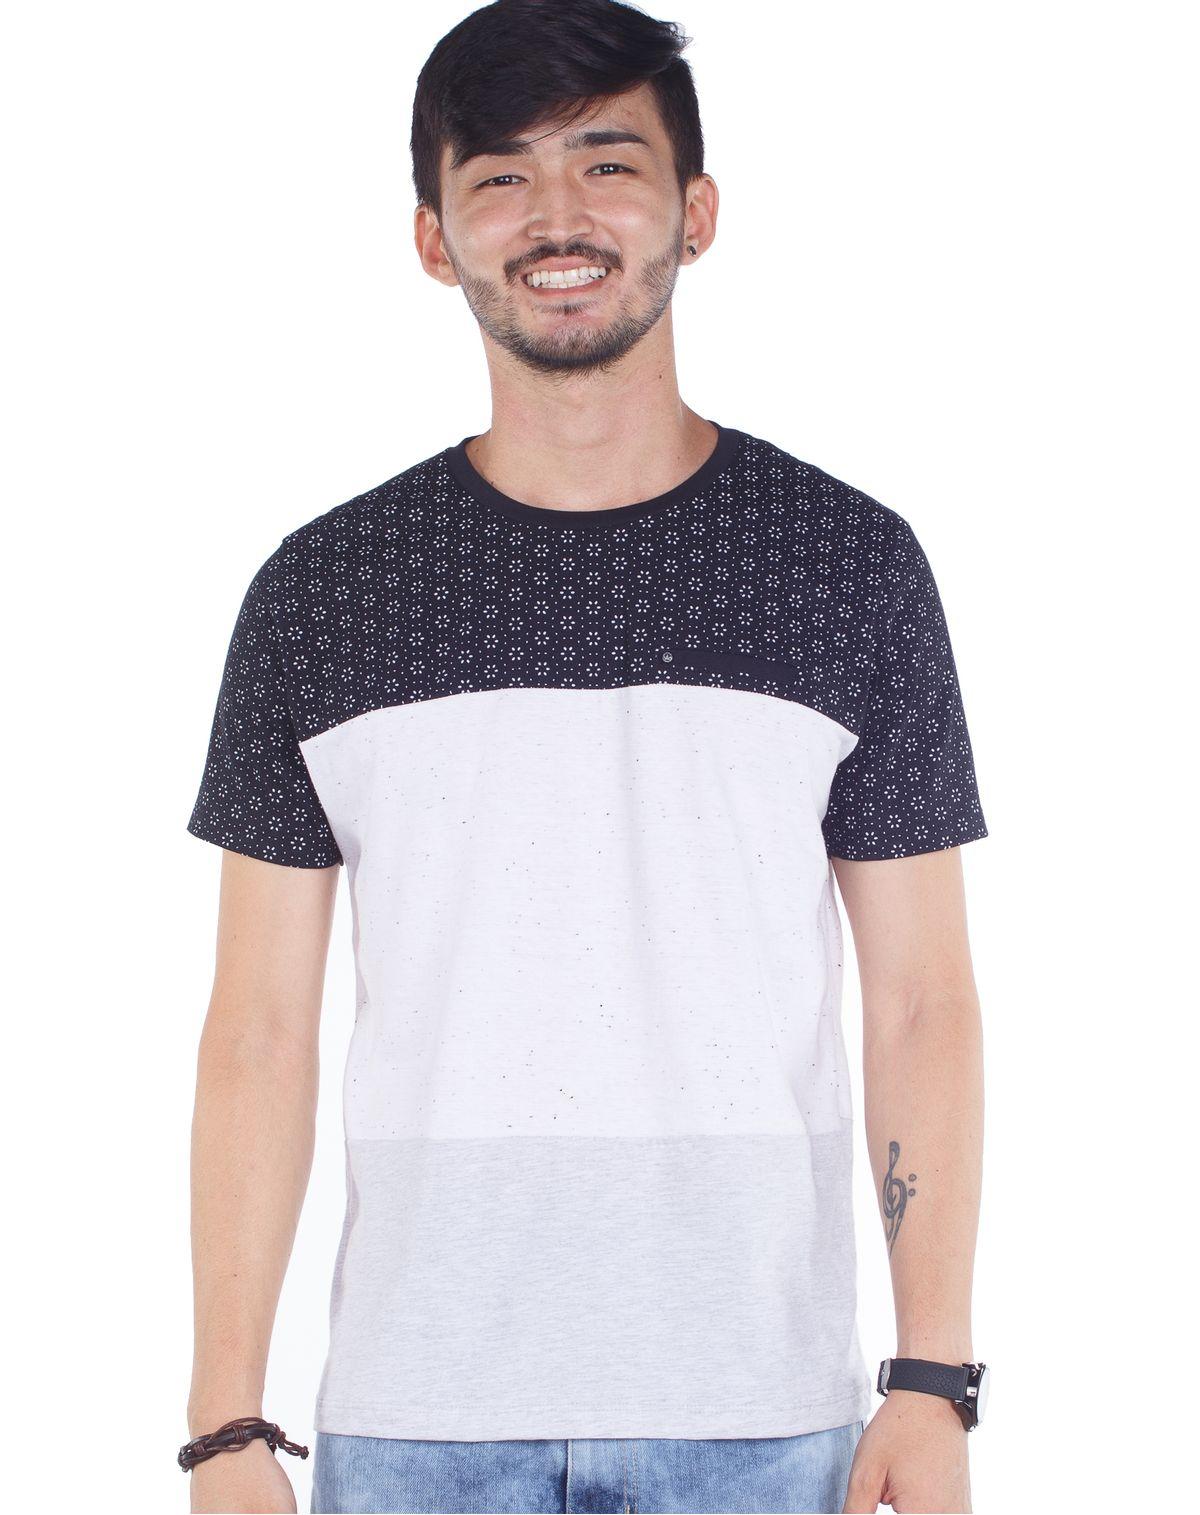 559358006-camiseta-manga-curta-masculino-recortes-botones-preto-m-a19